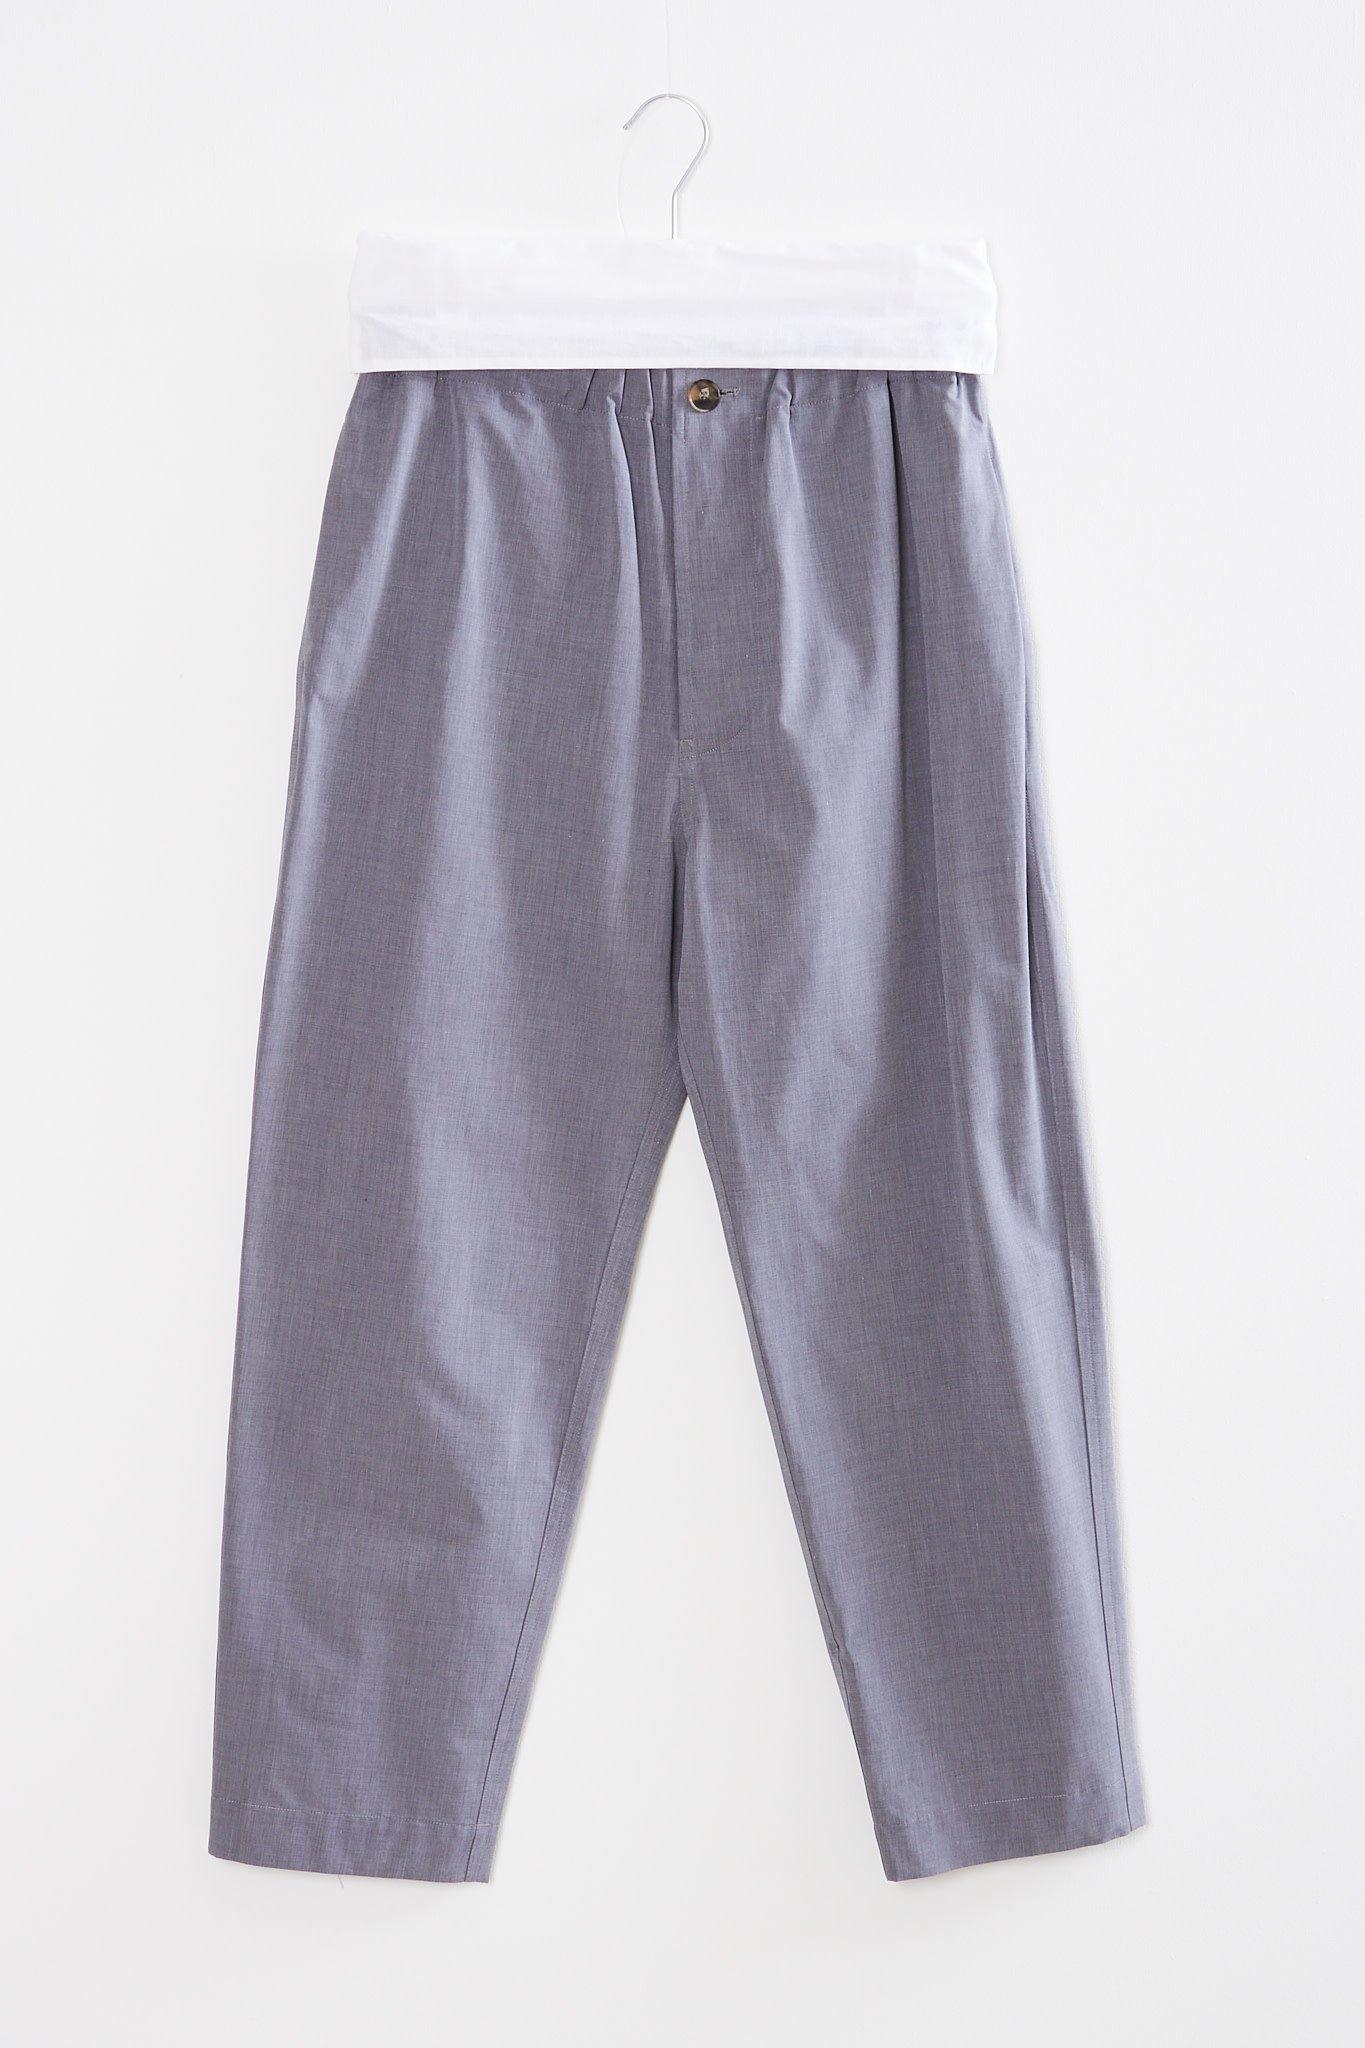 Sofie d'Hoore New piura double twisted cotton pants